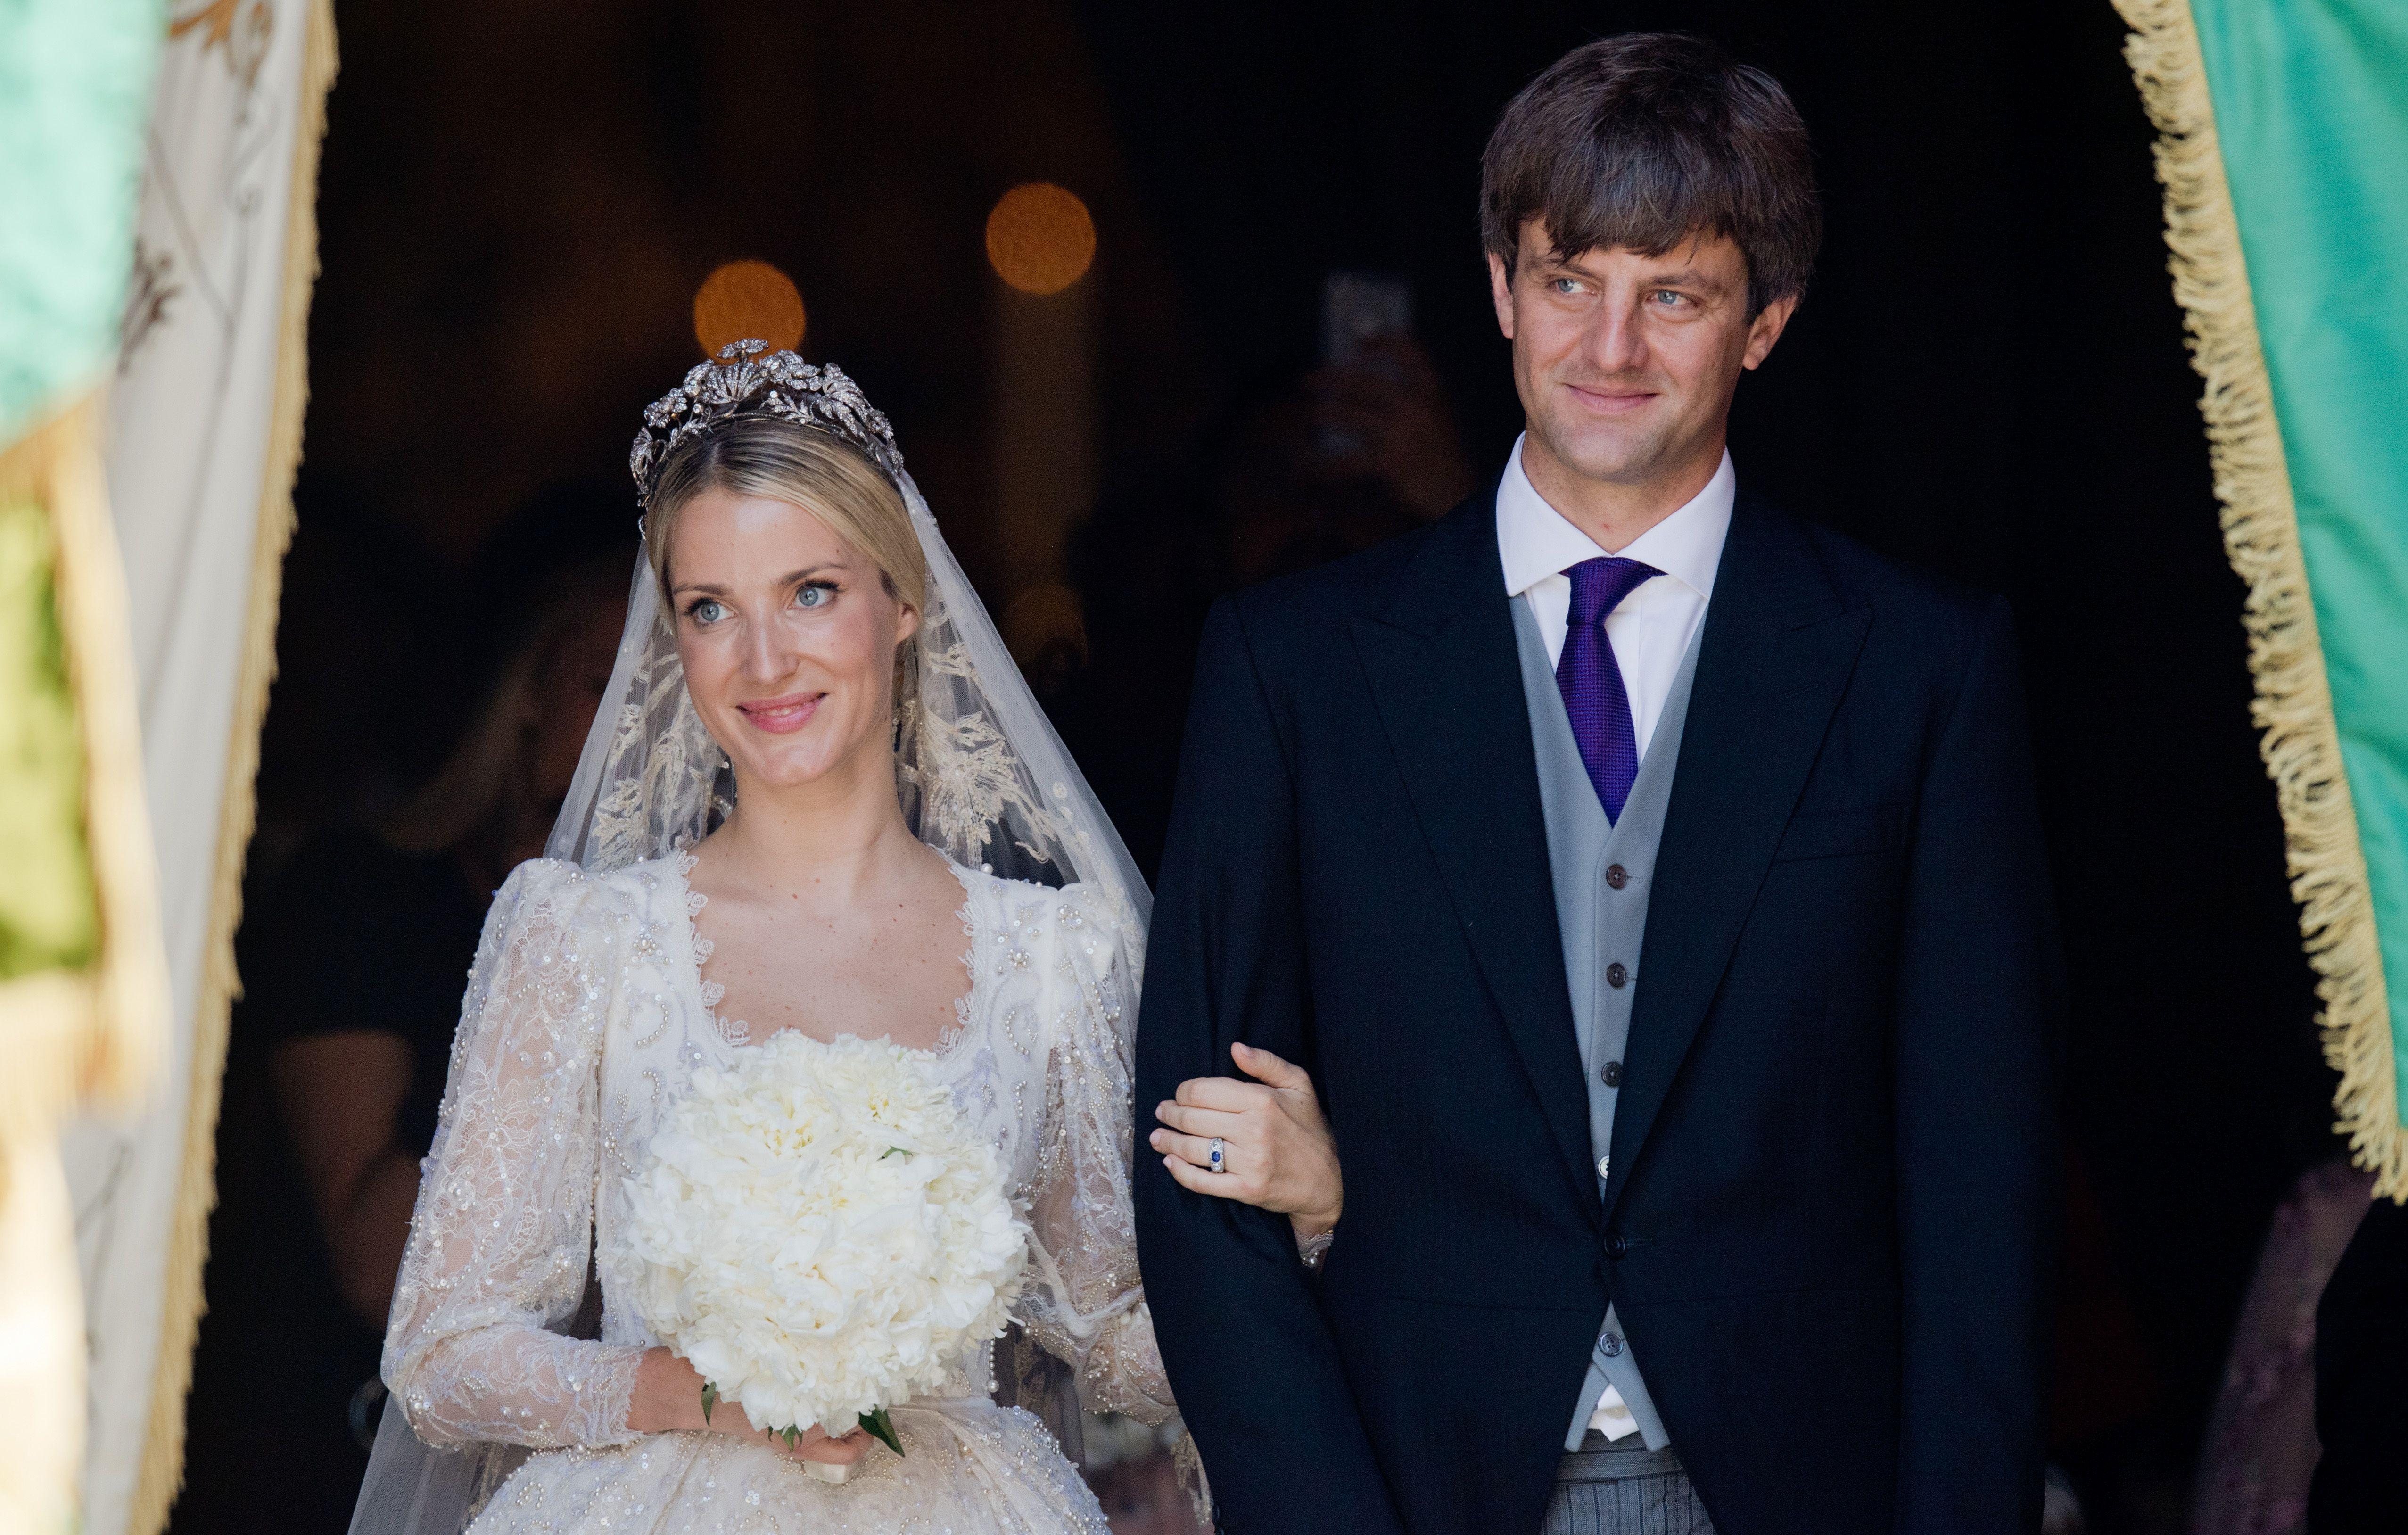 Prince Ernst-August Jr. and Ekaterina Malysheva at wedding